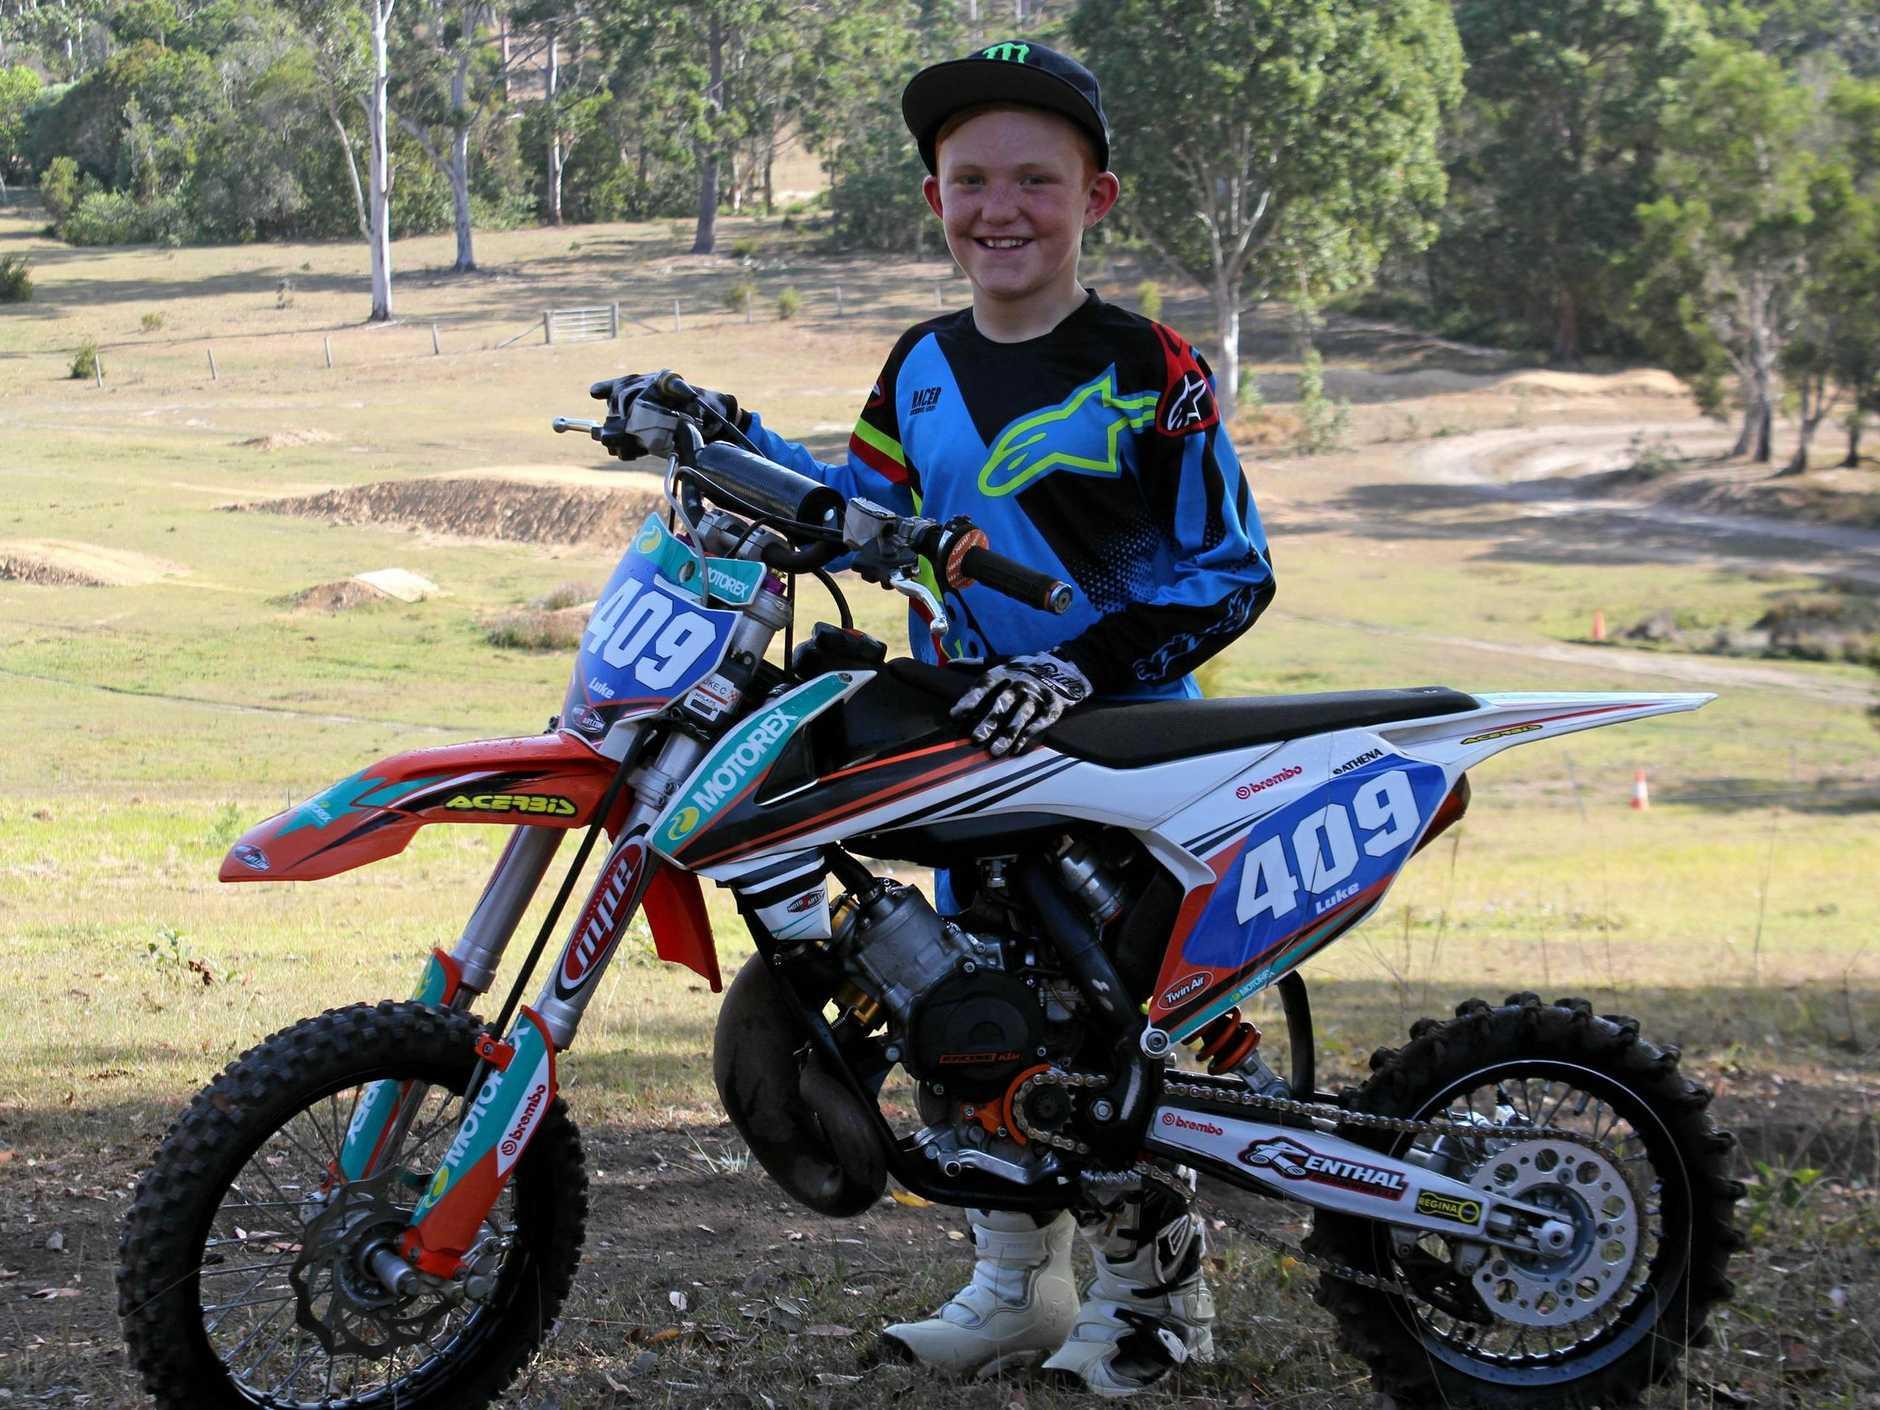 GYMPIE motocross rider Luke Constantine will fly the Queensland flag at this year's KTM Australian Junior MotoX Titles in Horsham, Victoria.